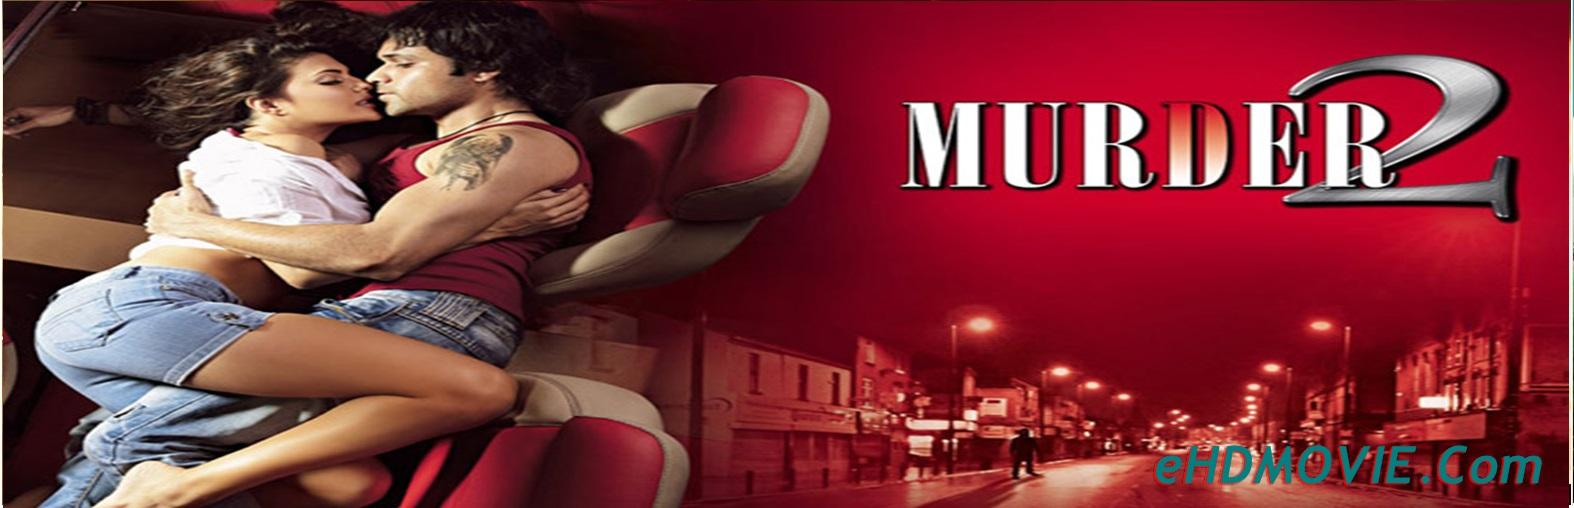 Murder 2 2011 Full Movie Hindi 720p - 480p ORG HDRip 400MB - 850MB ESubs Free Download